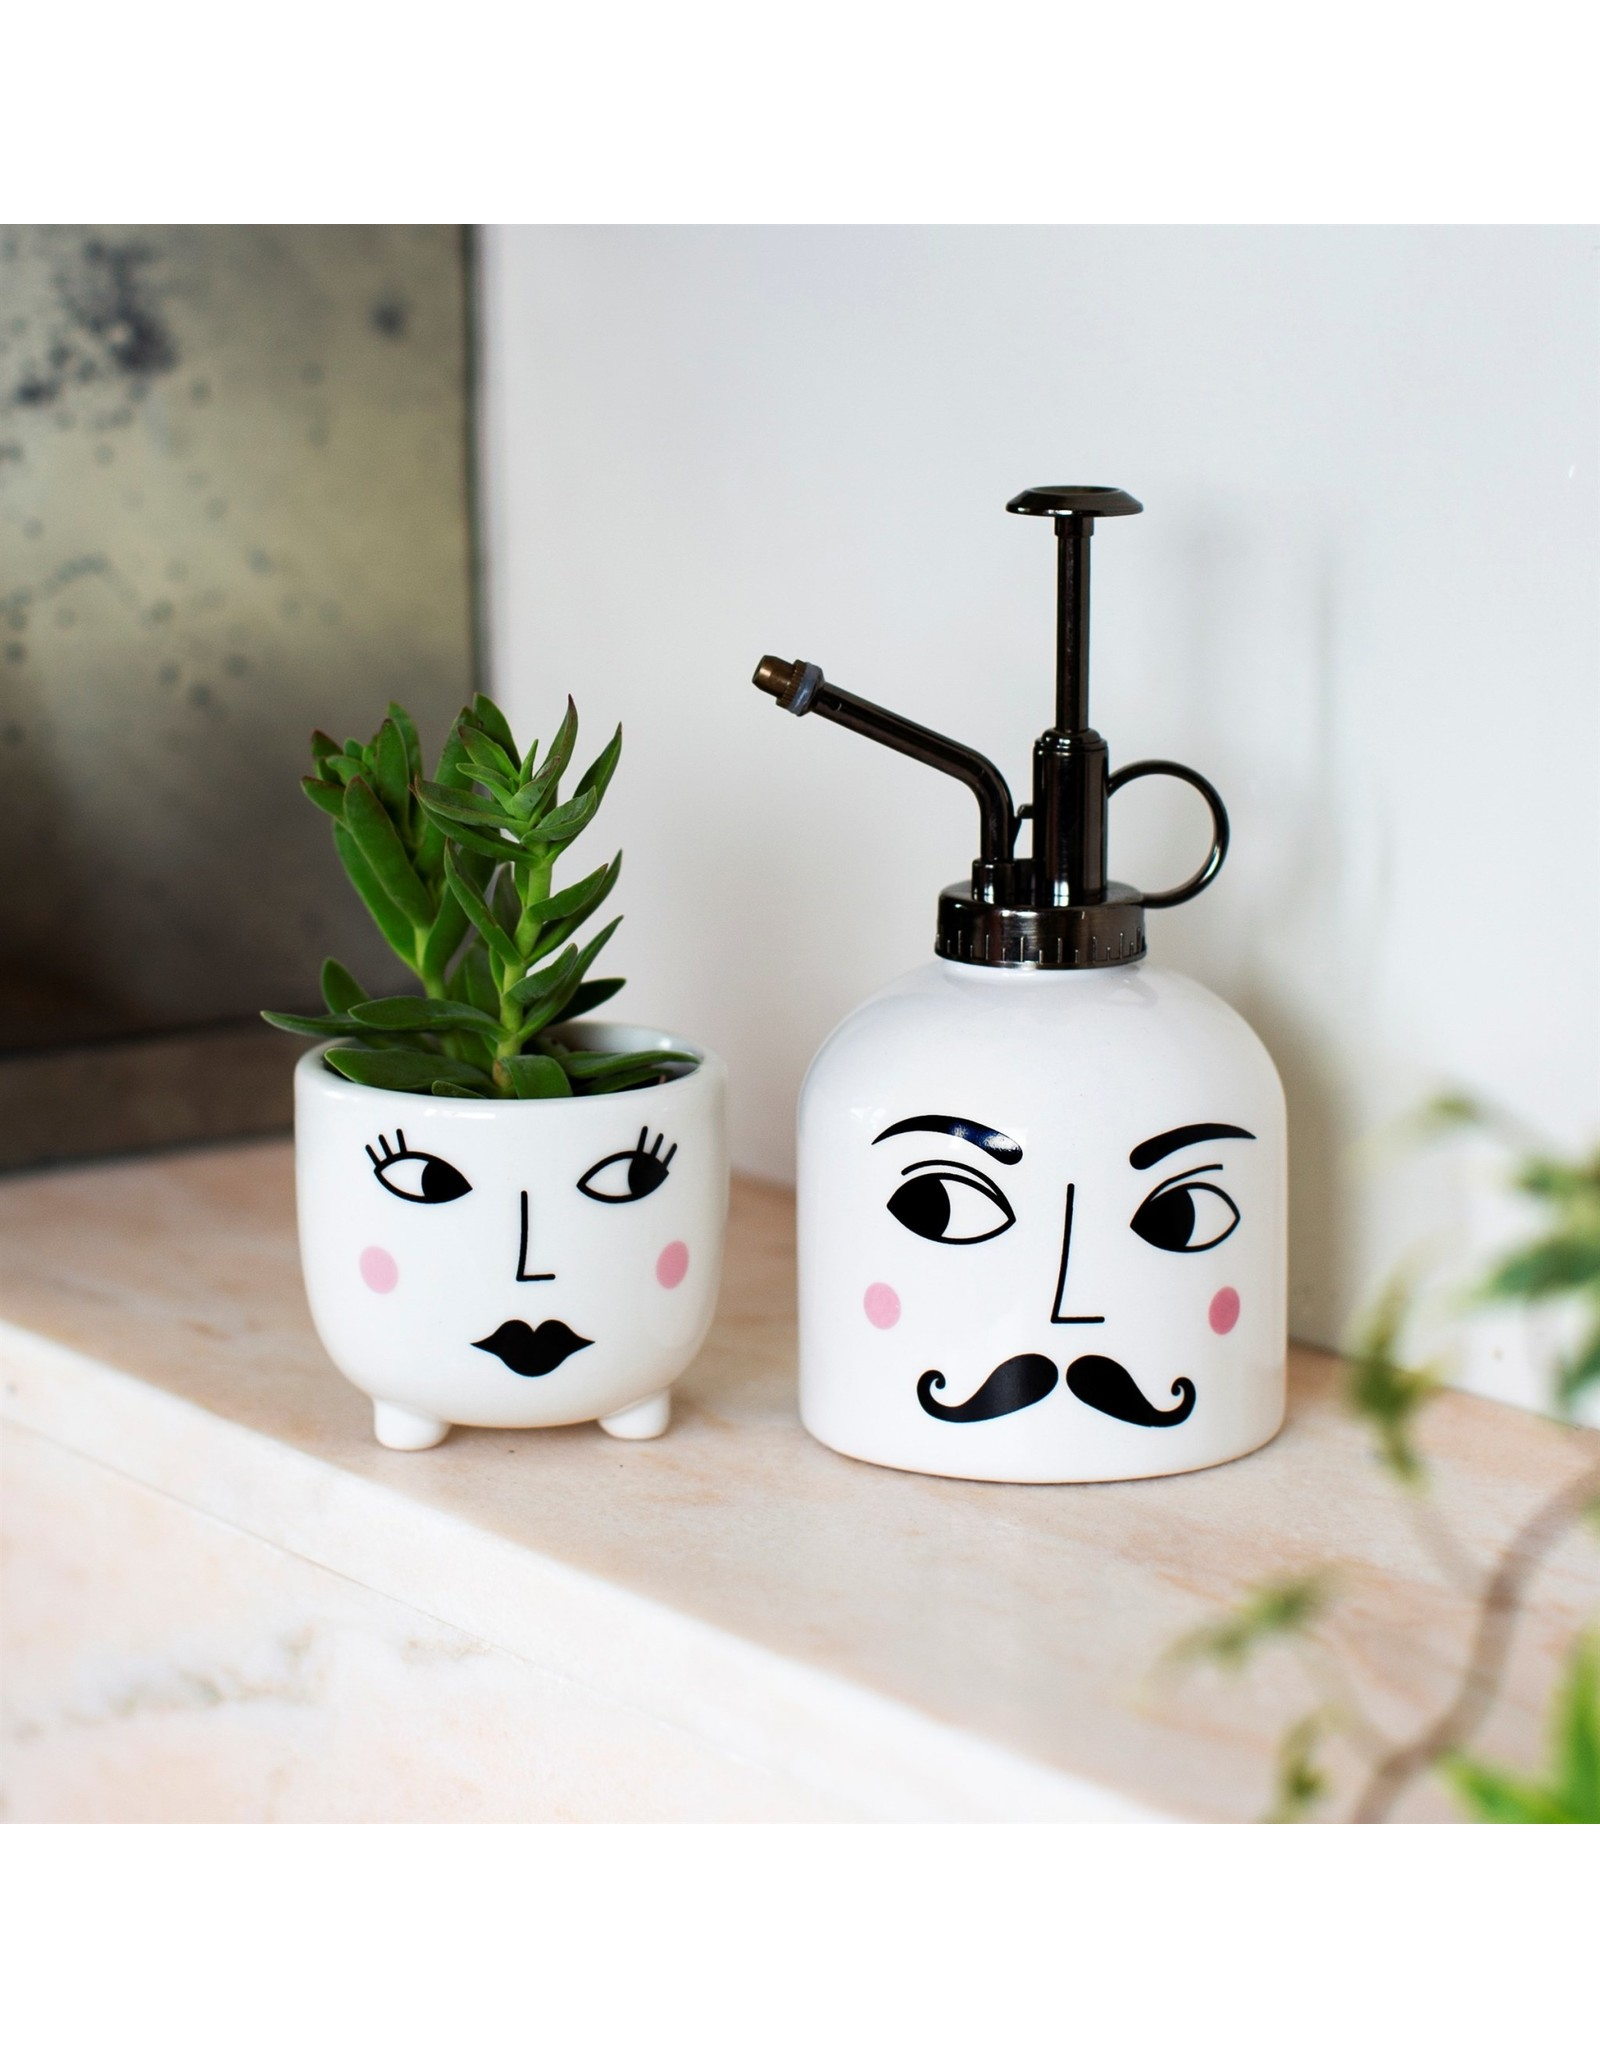 Bloempotje & plantenspuit